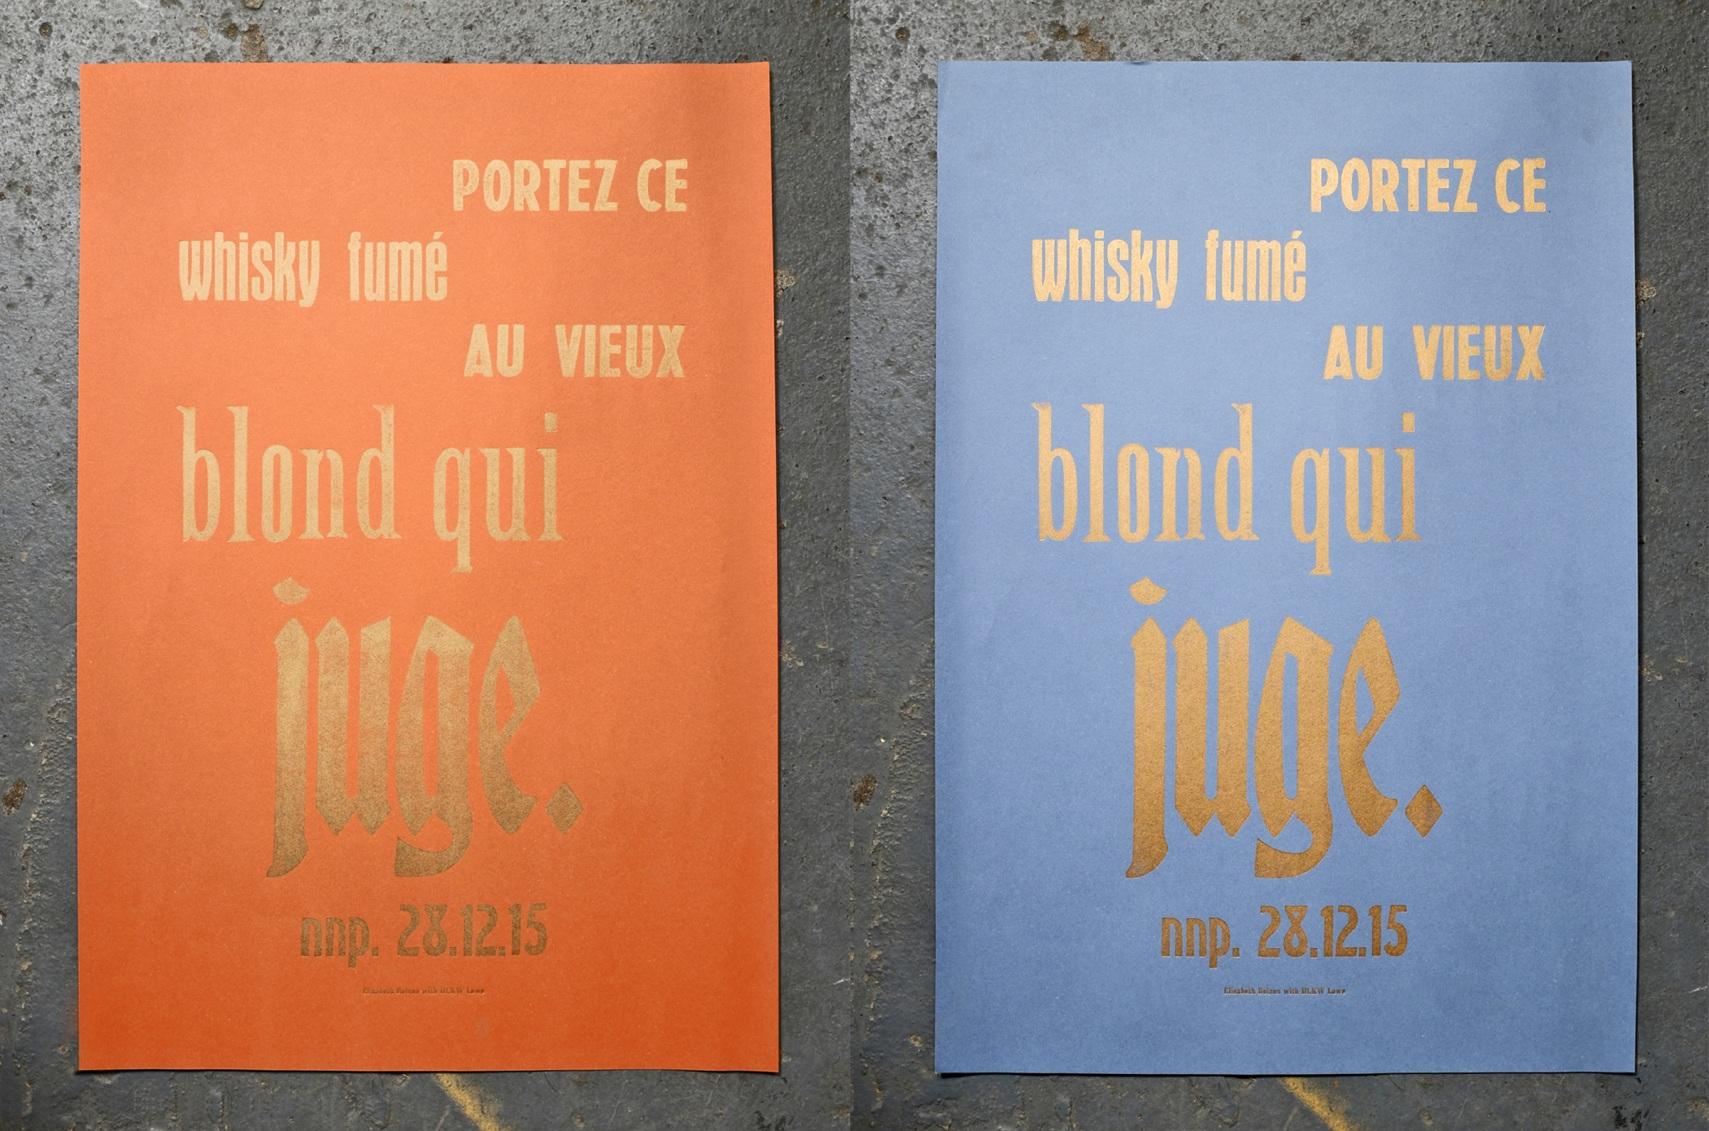 PangramShuffle_1a_Posters.jpg